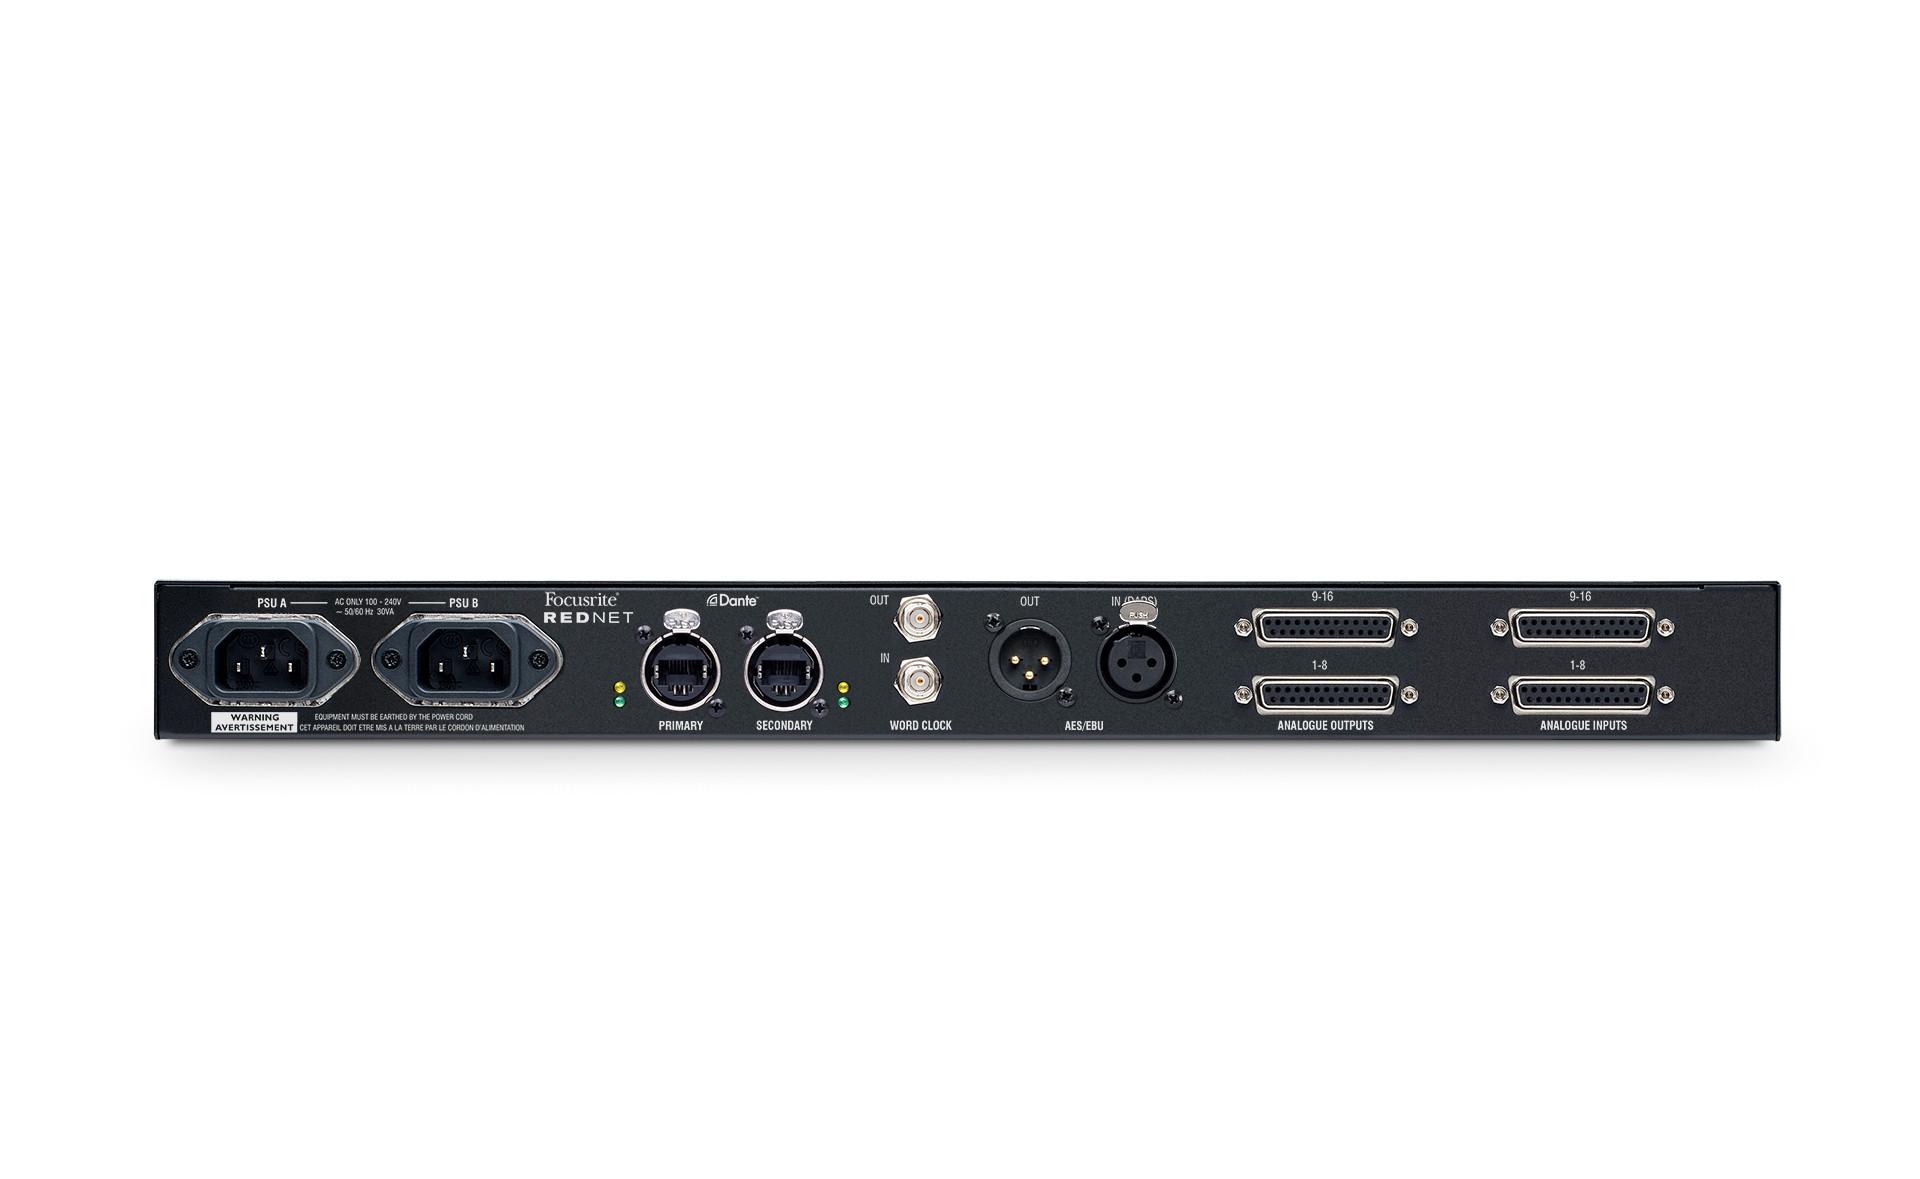 Focusrite Pro RedNet A16R 16-Channel Line-Level Dante AD/DA With Network And PSU Redundancy REDNET-A16R